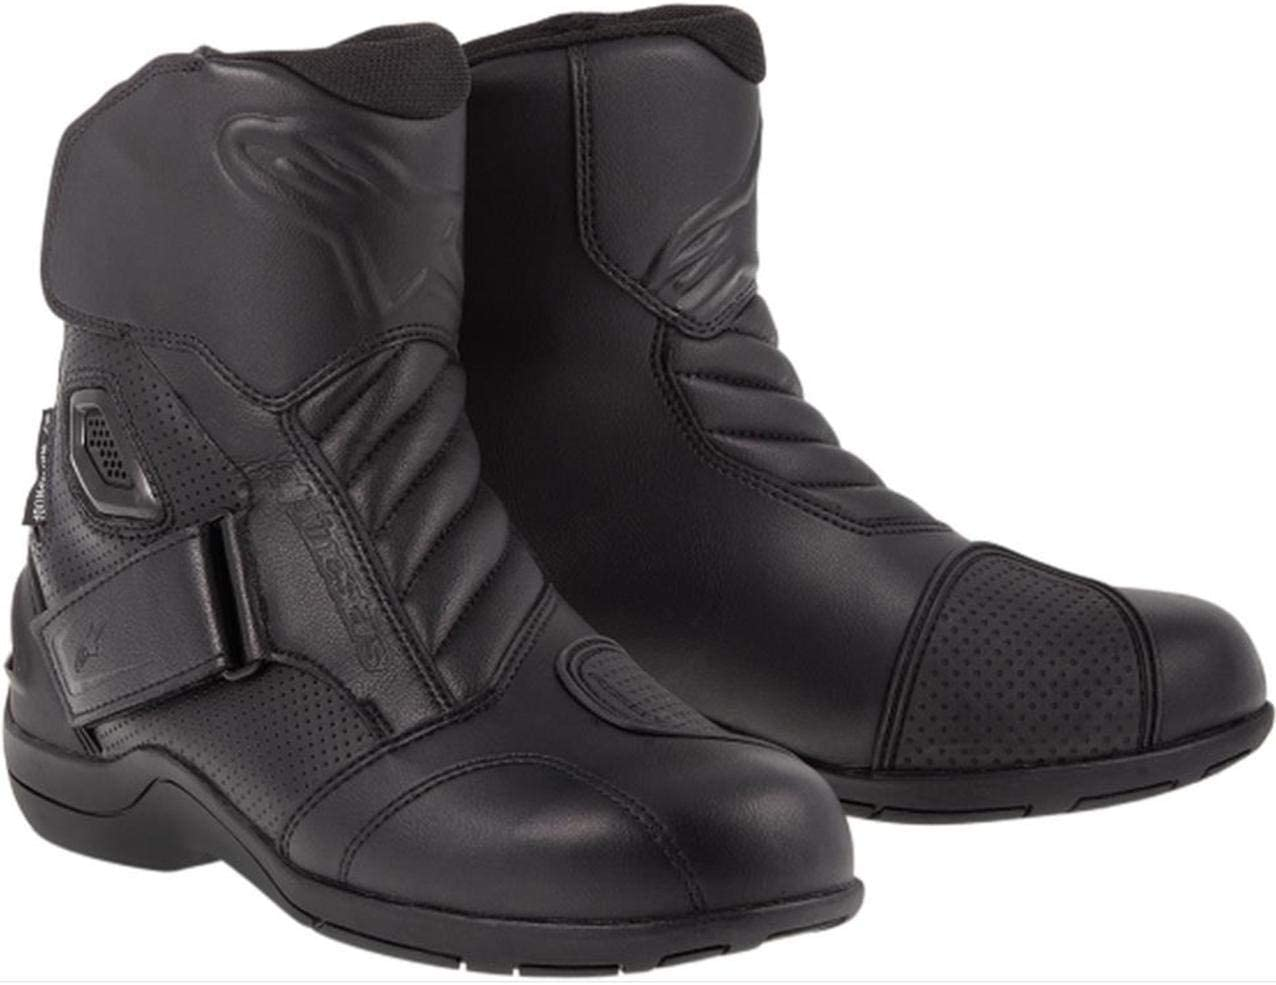 AlpinestarsGunner Waterproof Boots